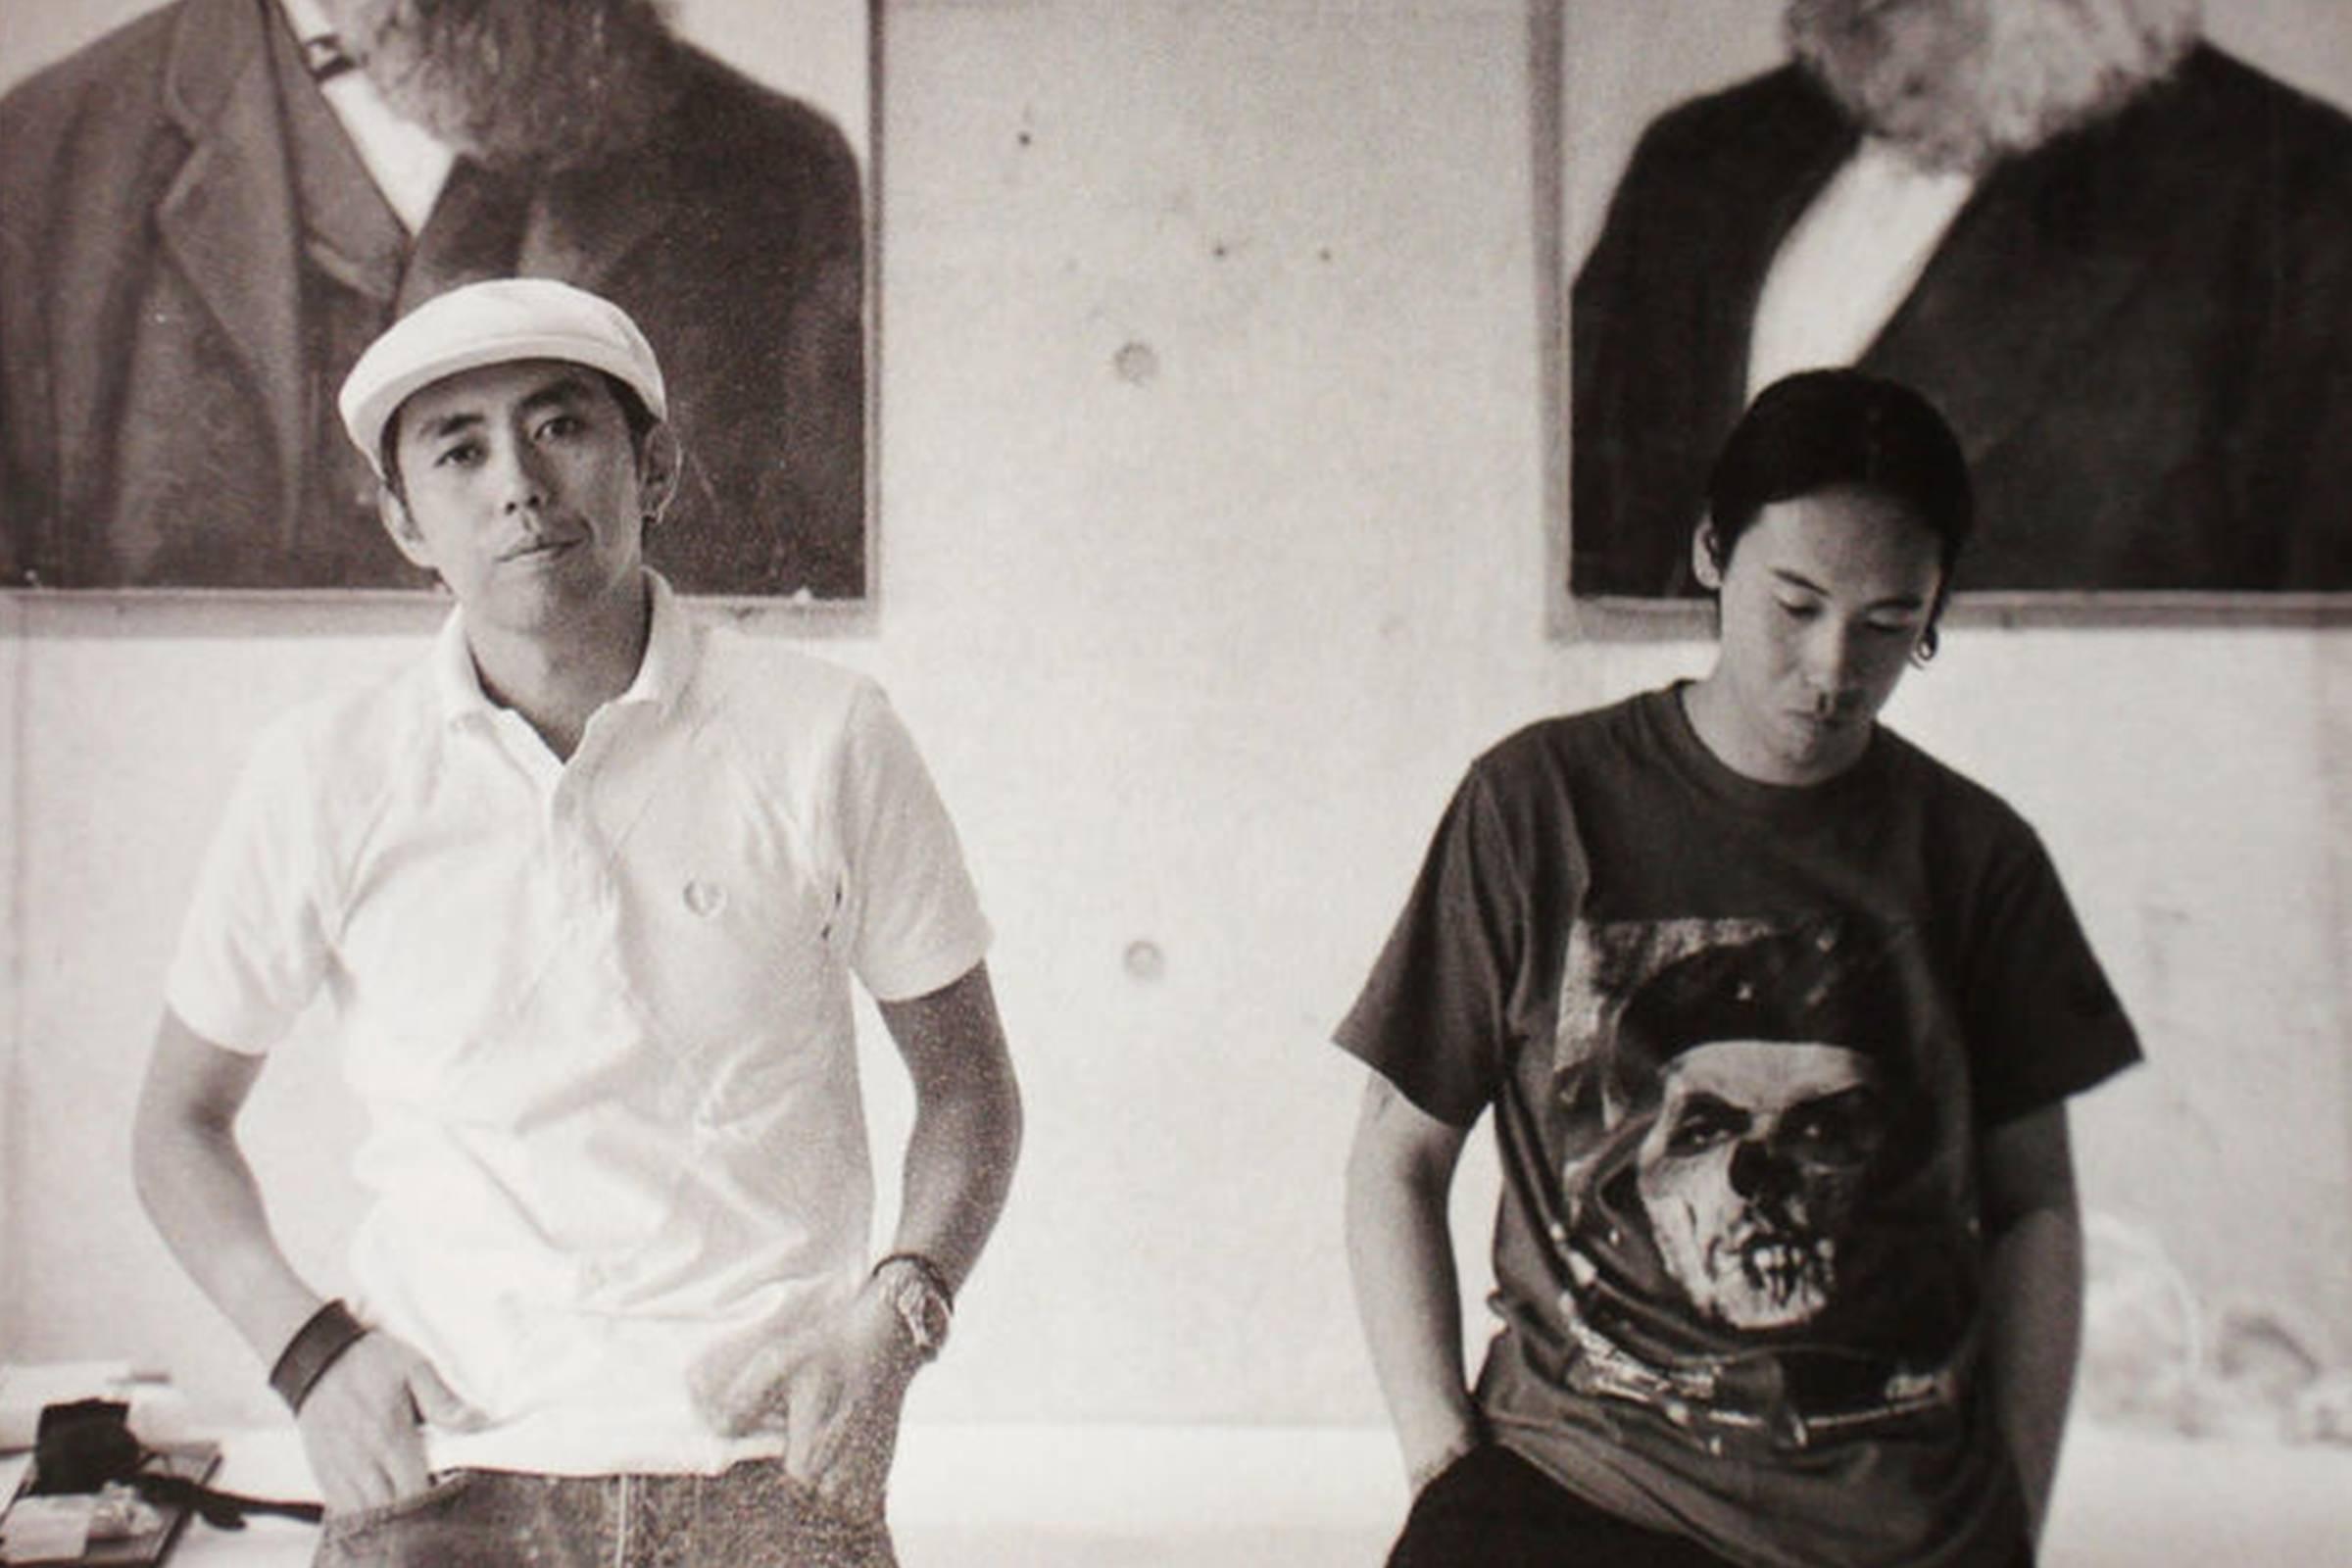 Hiroshi Fujiwara (left) and Jun Takahashi (right), leaders in the Ura-Harajuku scene (1990)